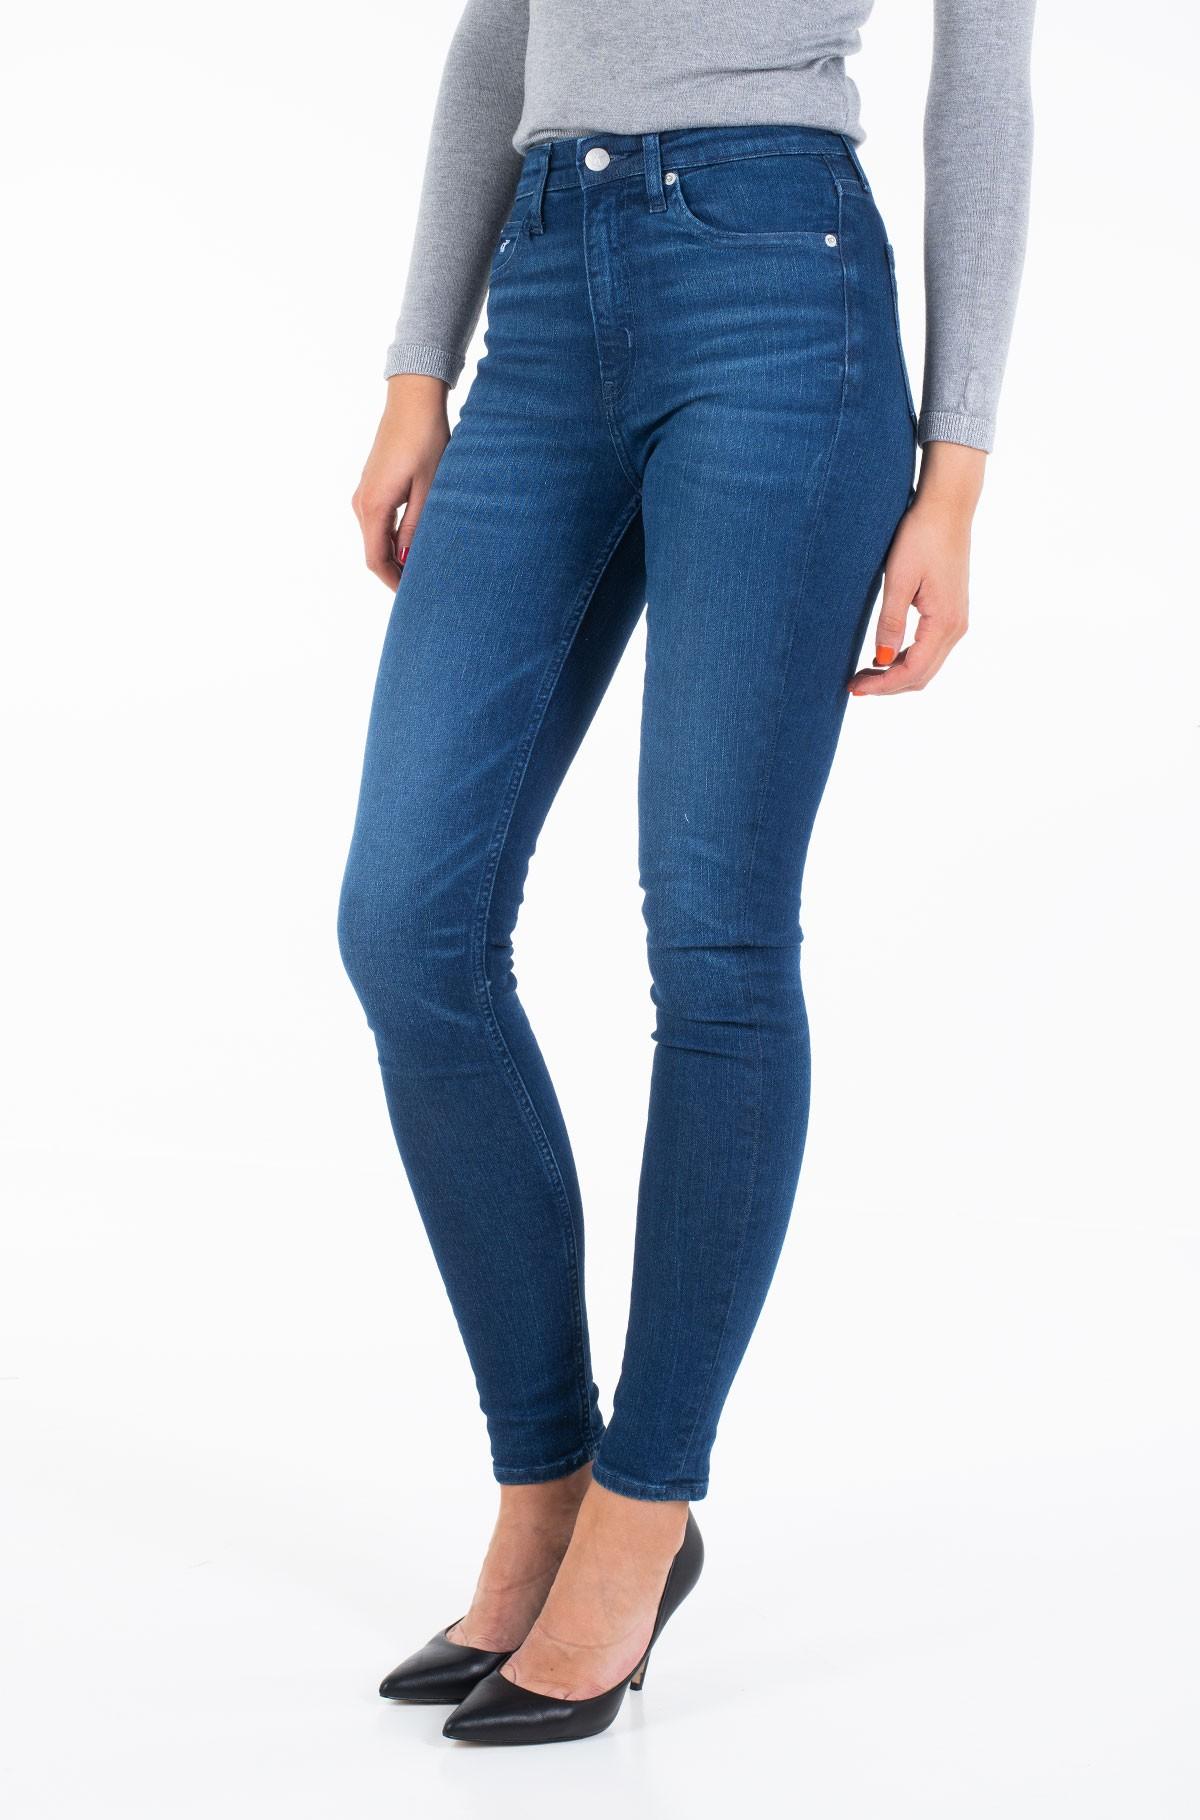 Jeans CKJ 010 HIGH RISE SKINNY J20J213132-full-1